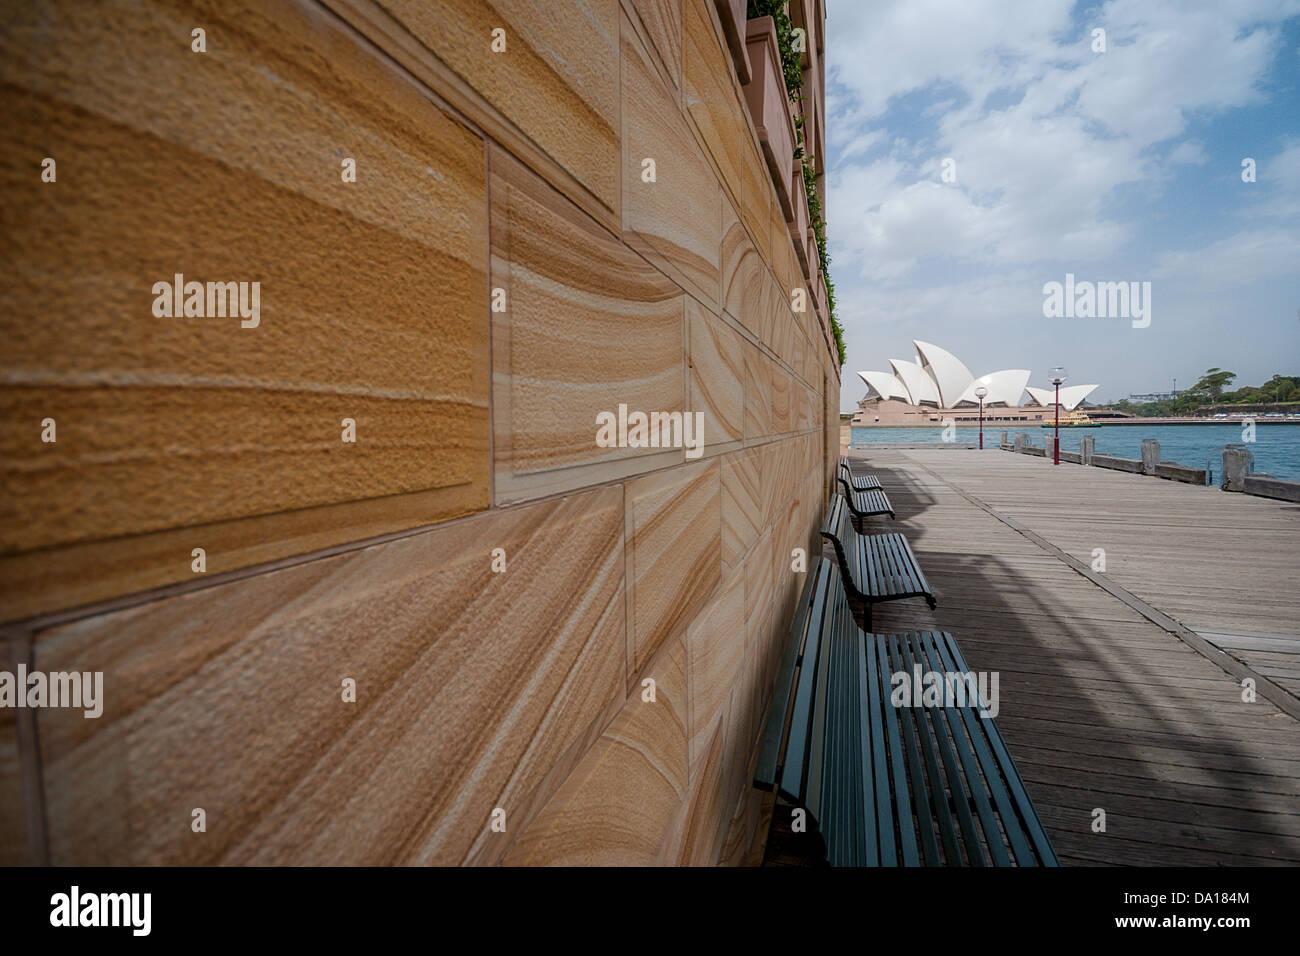 Sydney Opera House from the Park Hyatt across Sydney Cove at Dawes Point. - Stock Image